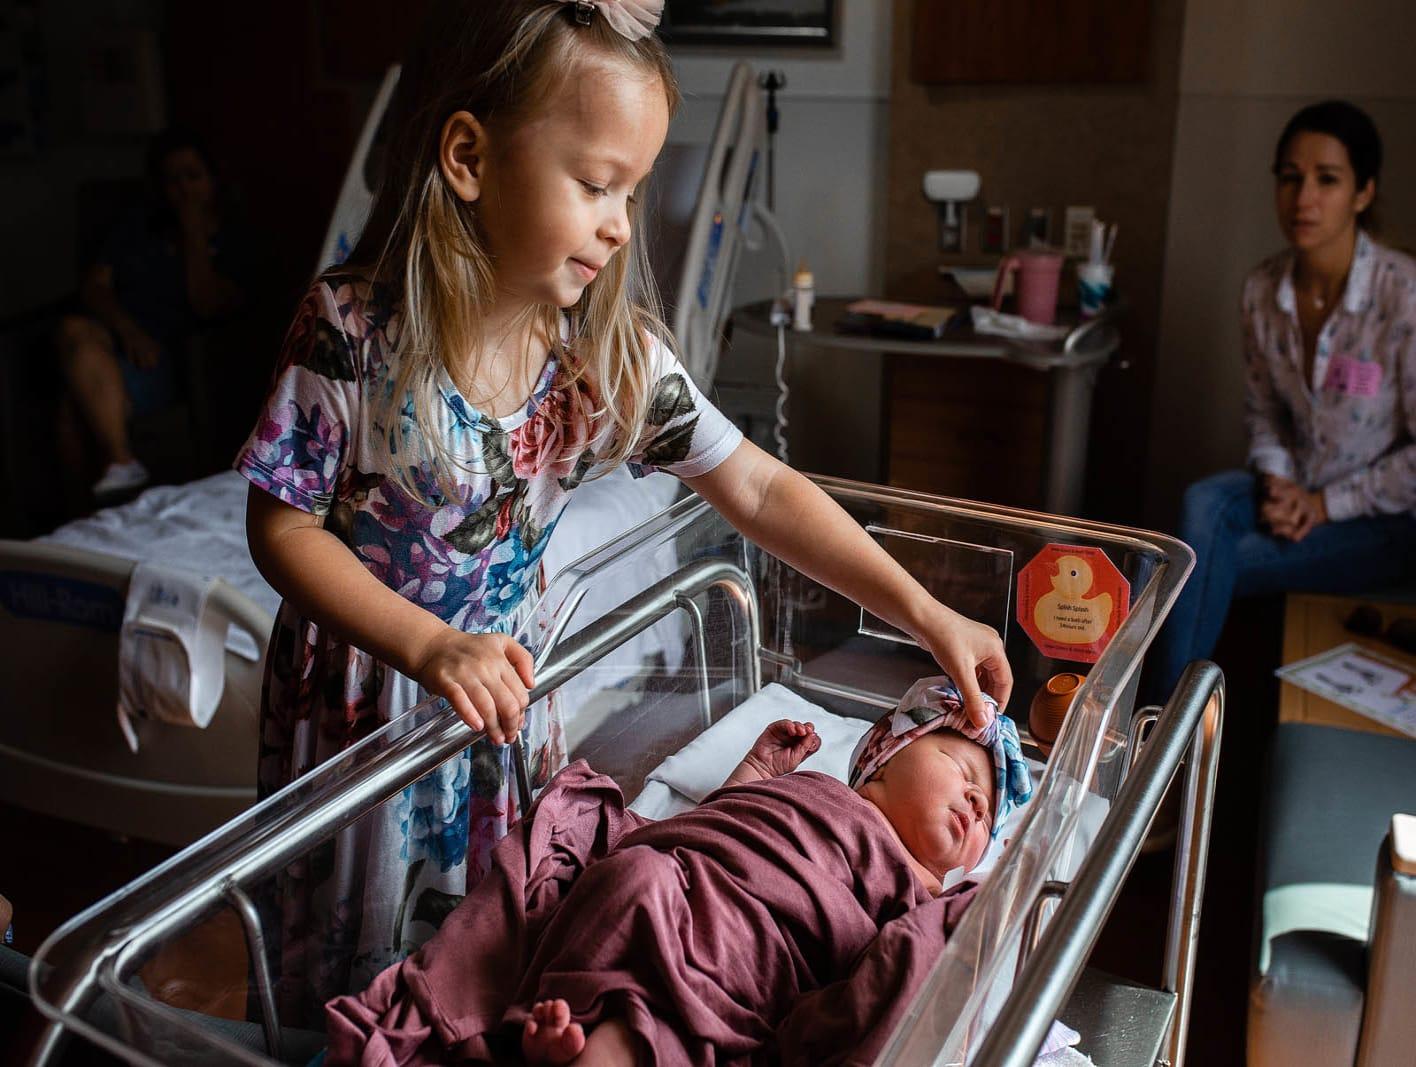 newborn photographer raleigh nc fresh 48 photo shoot rex hospital